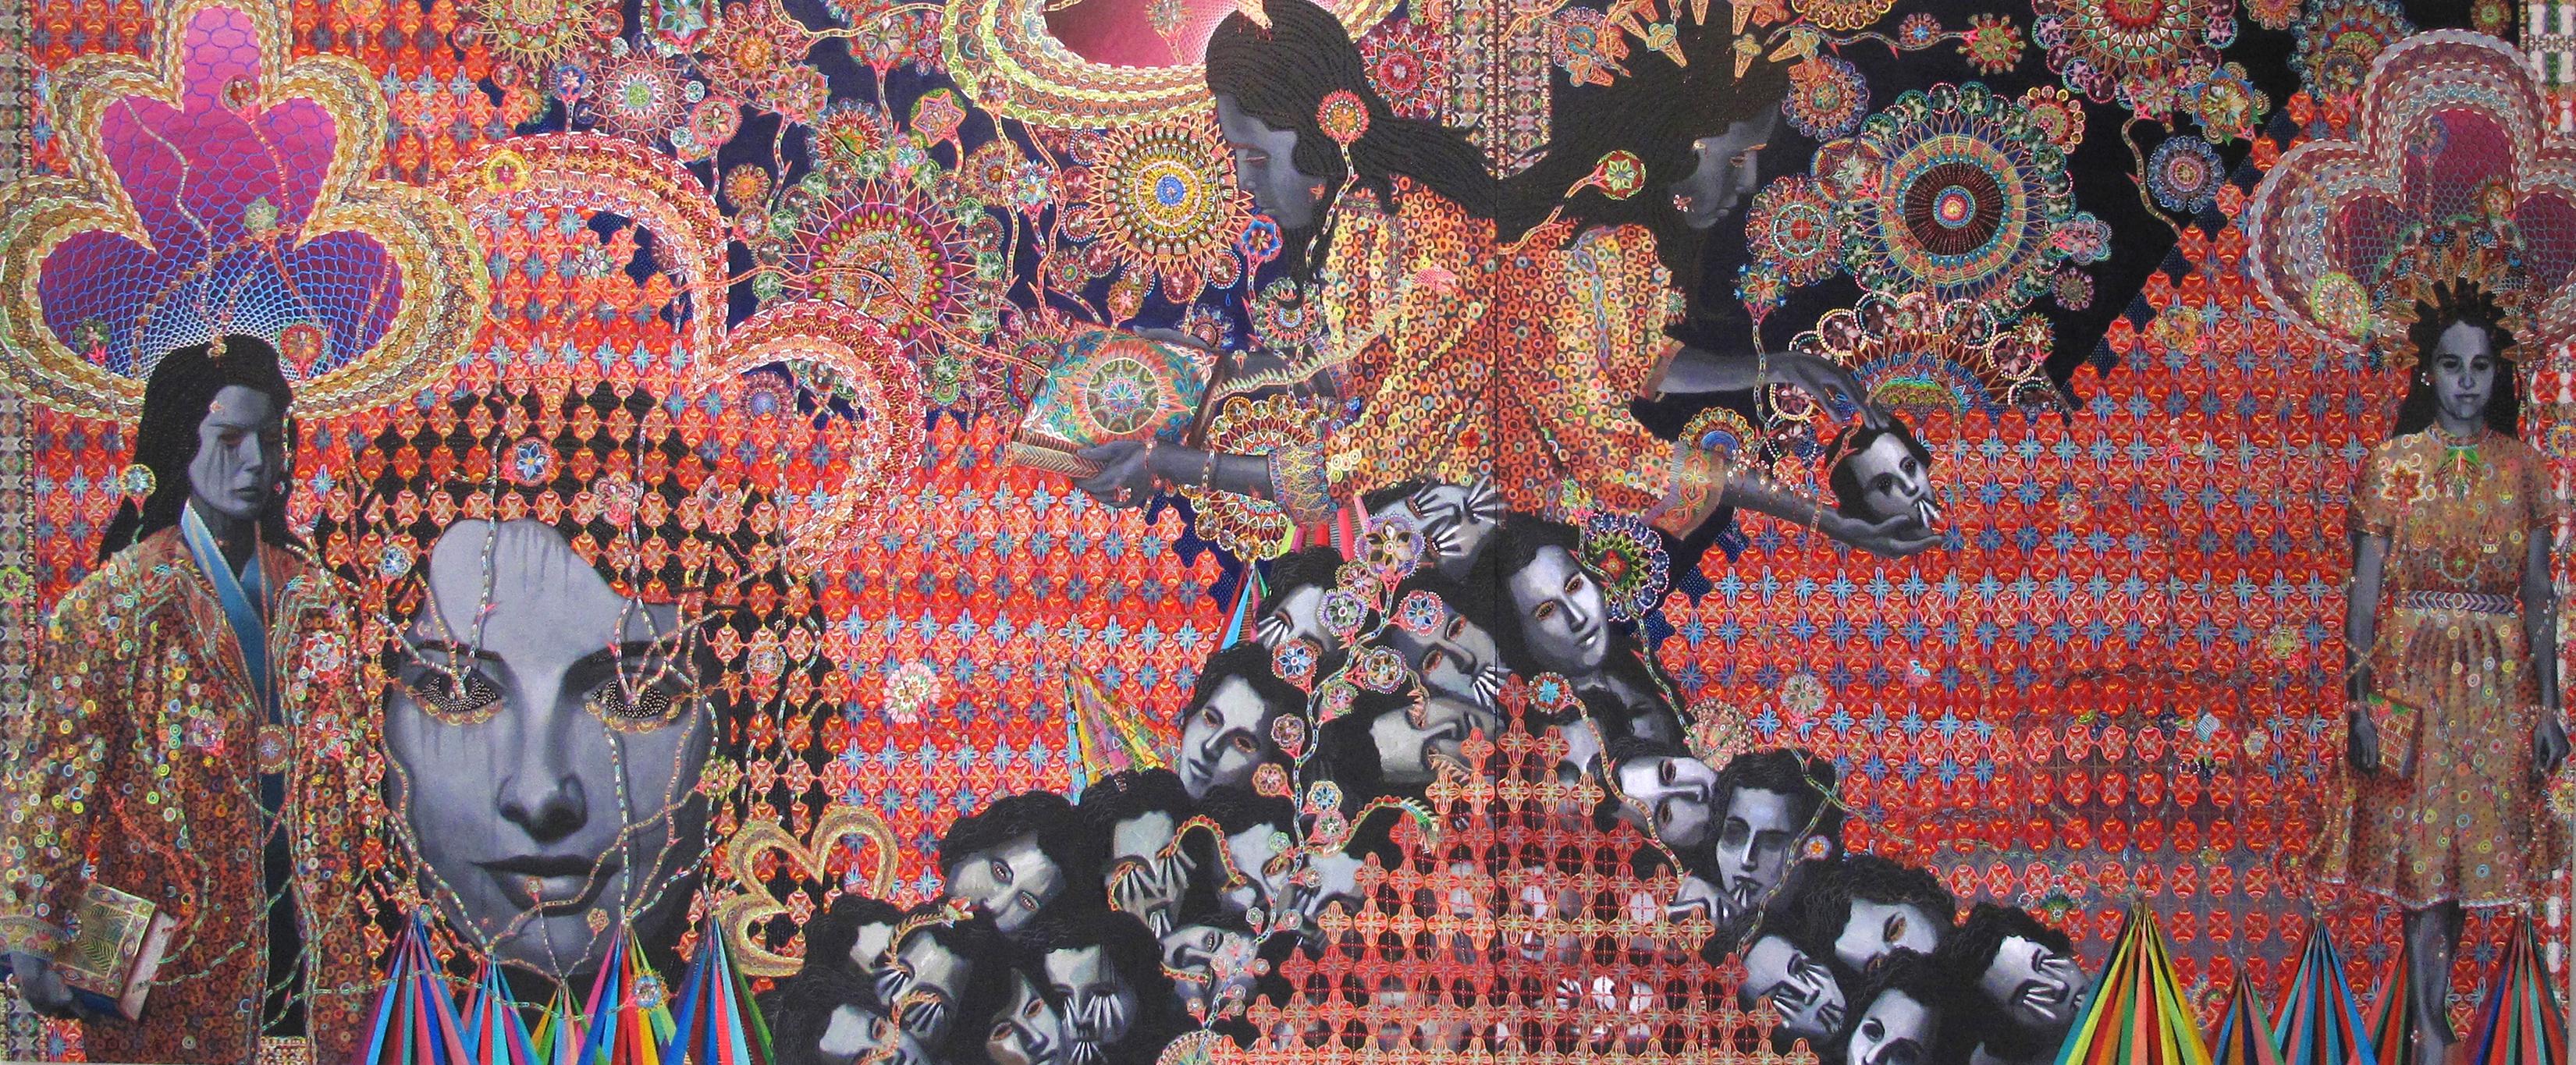 Les Femmes D Alger #20, 2012